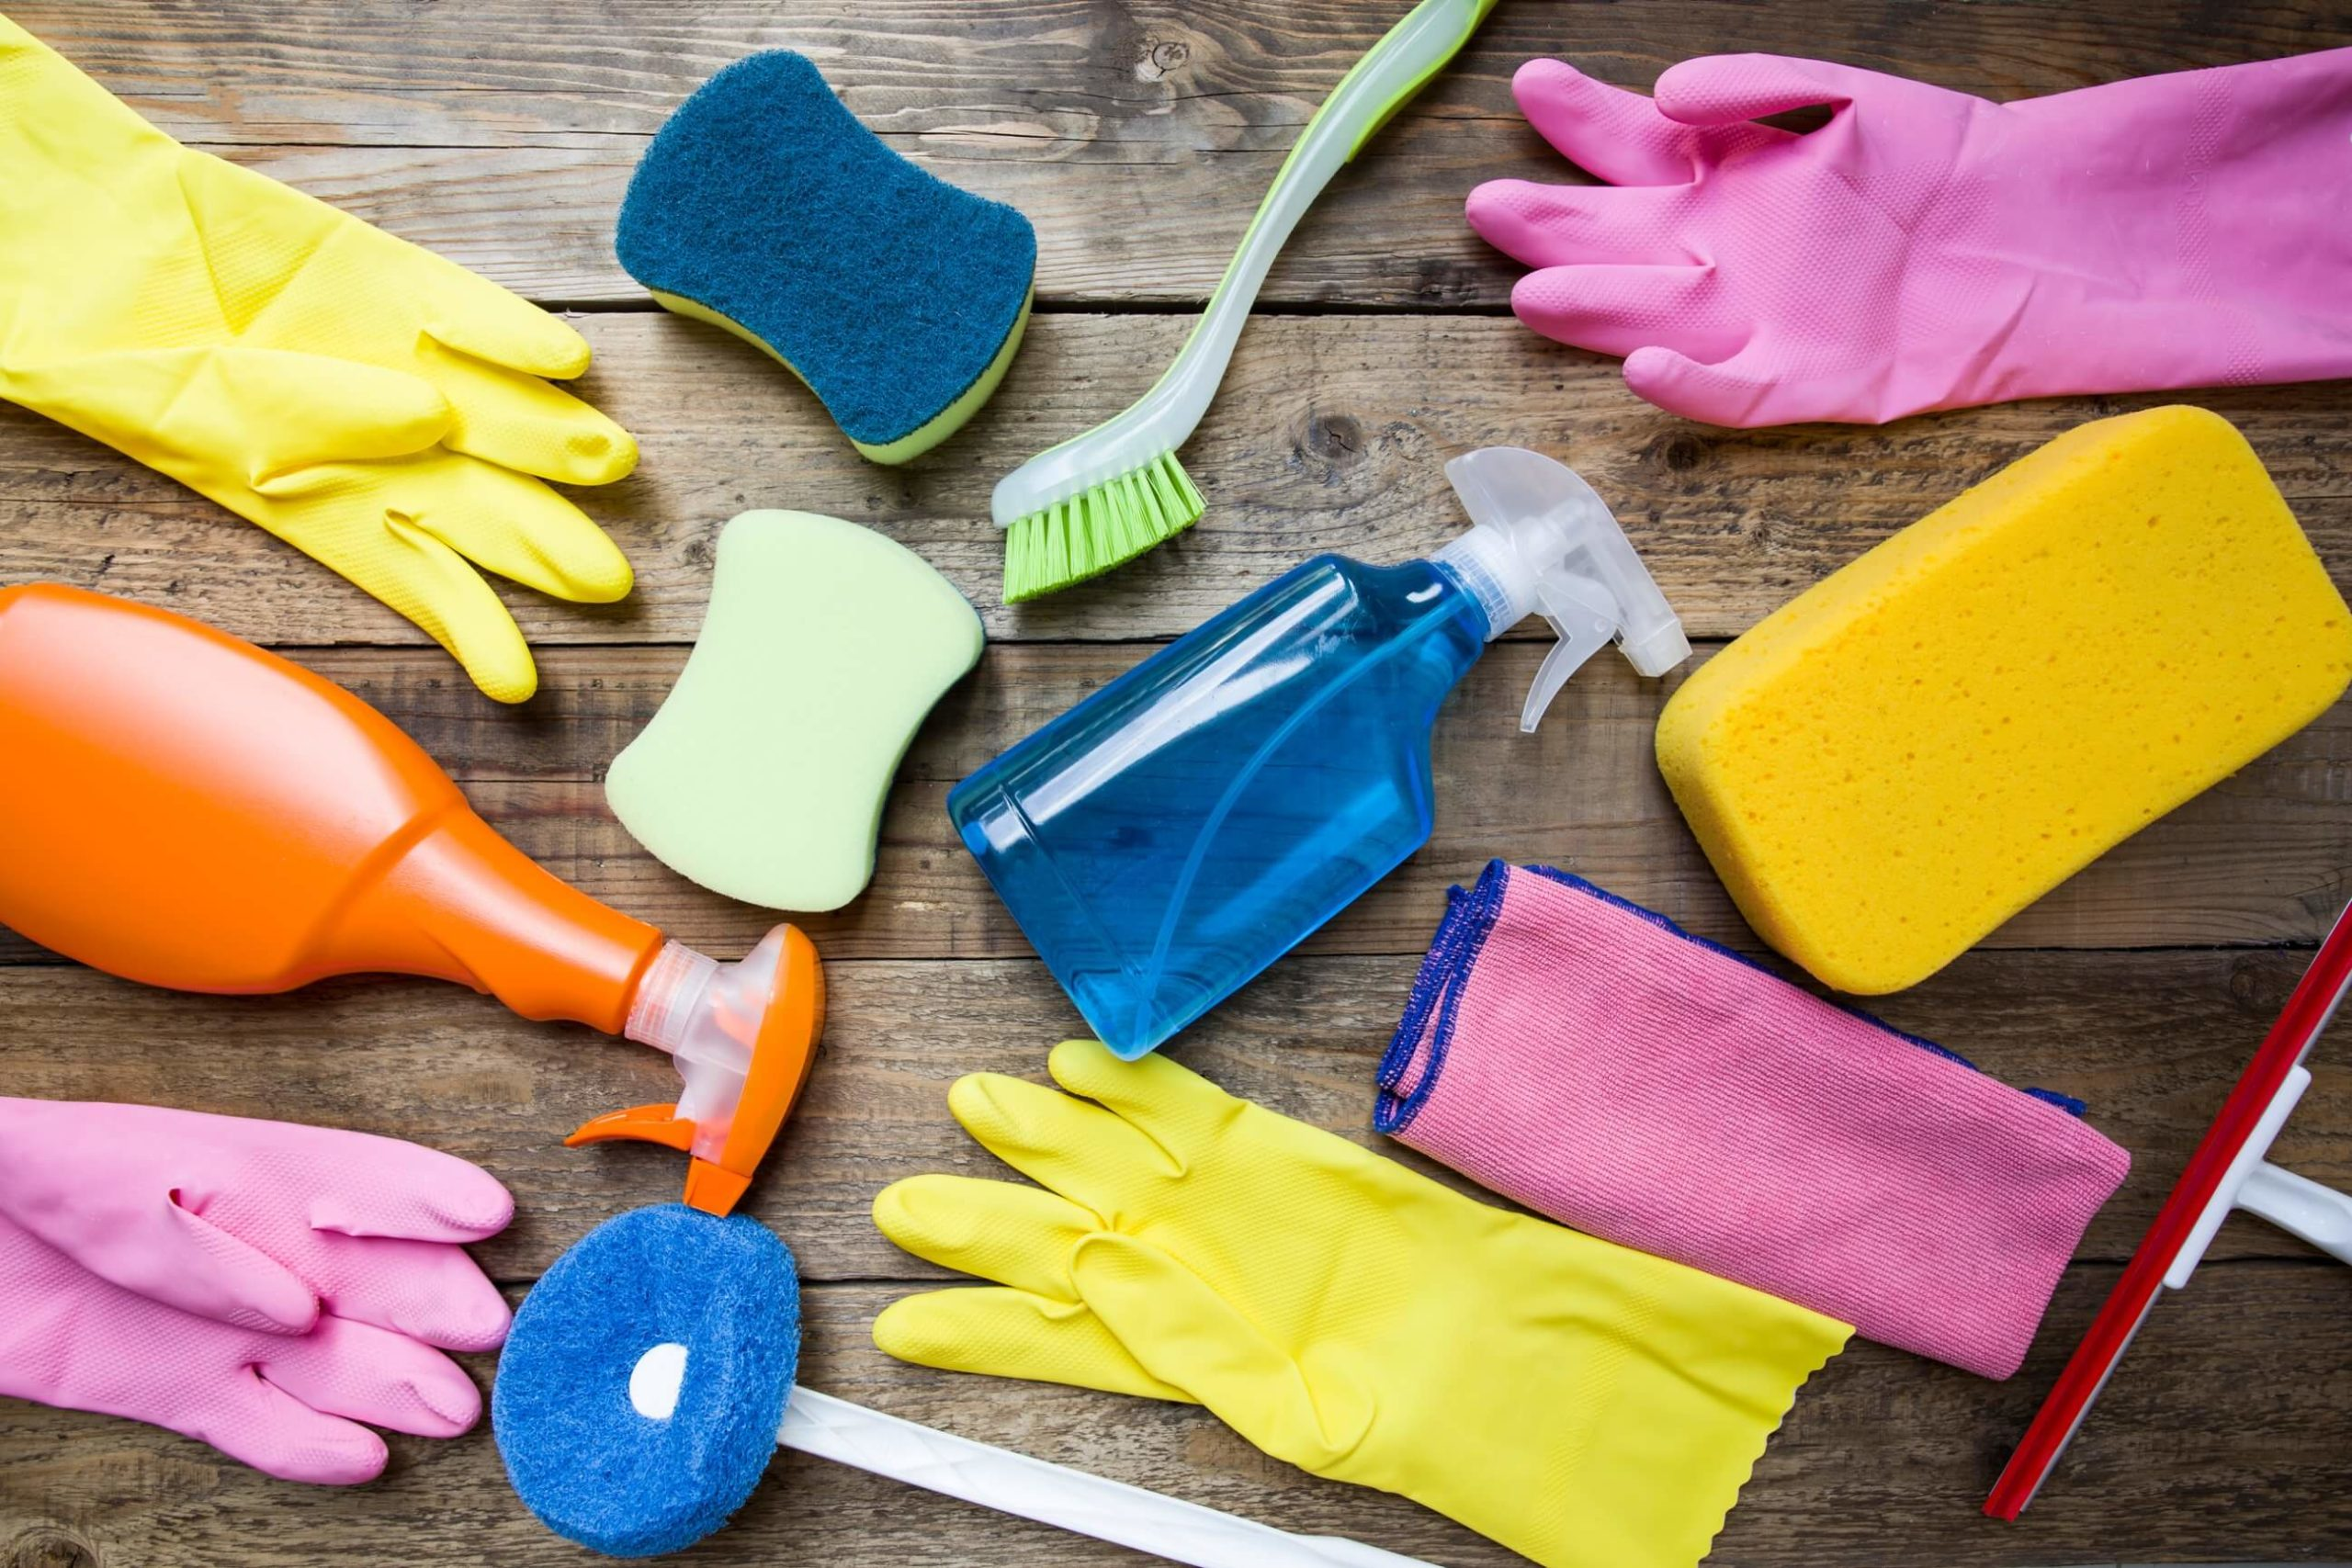 Уборка домов 🧹 клининг квартир коттеджей Ситники 🏠